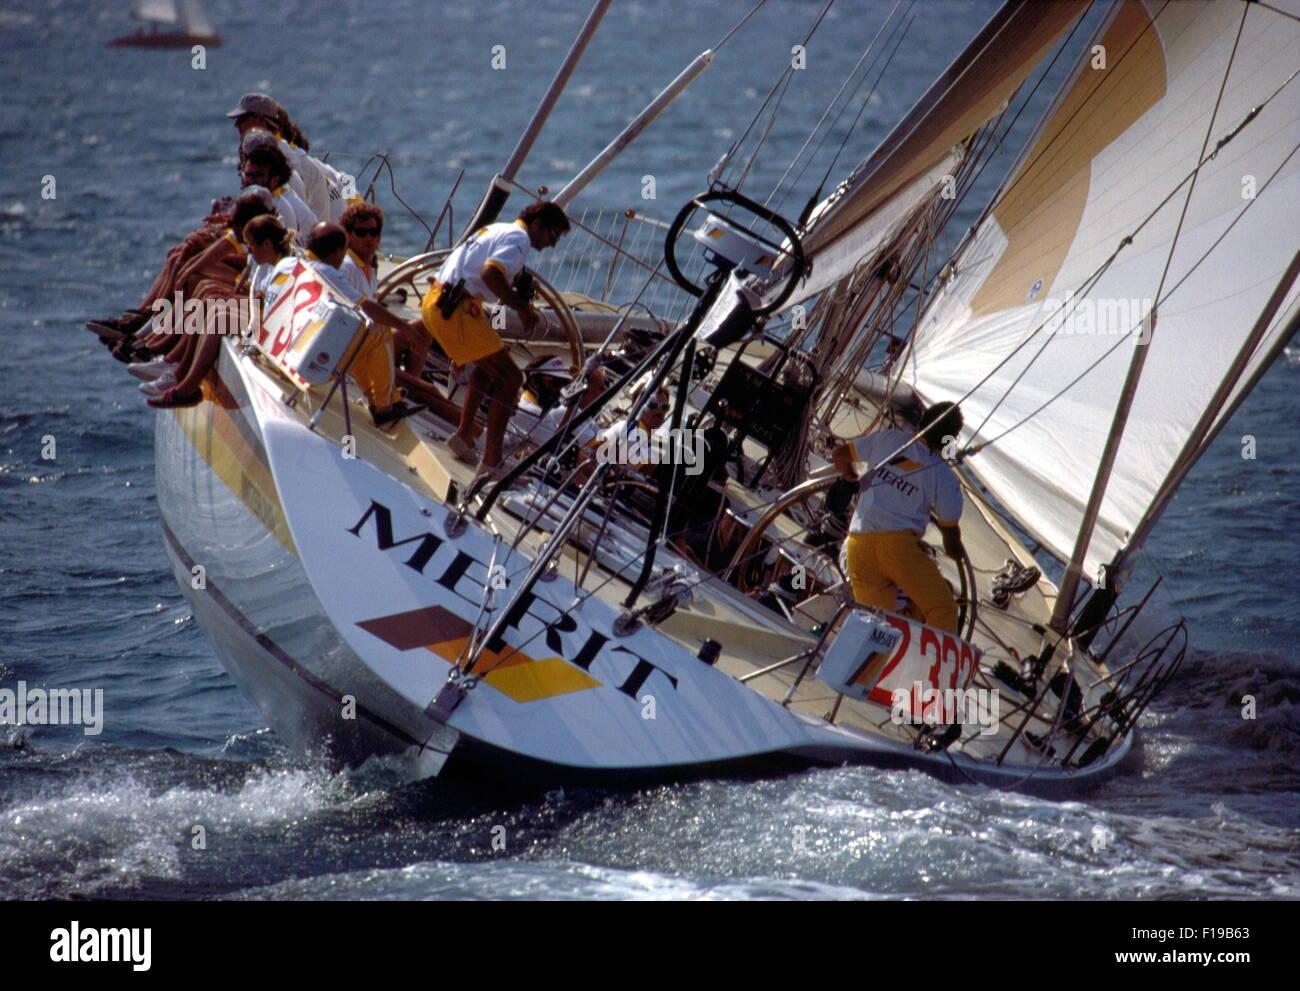 AJAXNETPHOTO. 1989. SOLENT, ENGLAND. FASTNET RACE 1989 - SWISS YACHT MERIT SKIPPERED BY PIERRE FEHLMANN. BRUCE FARR Stock Photo